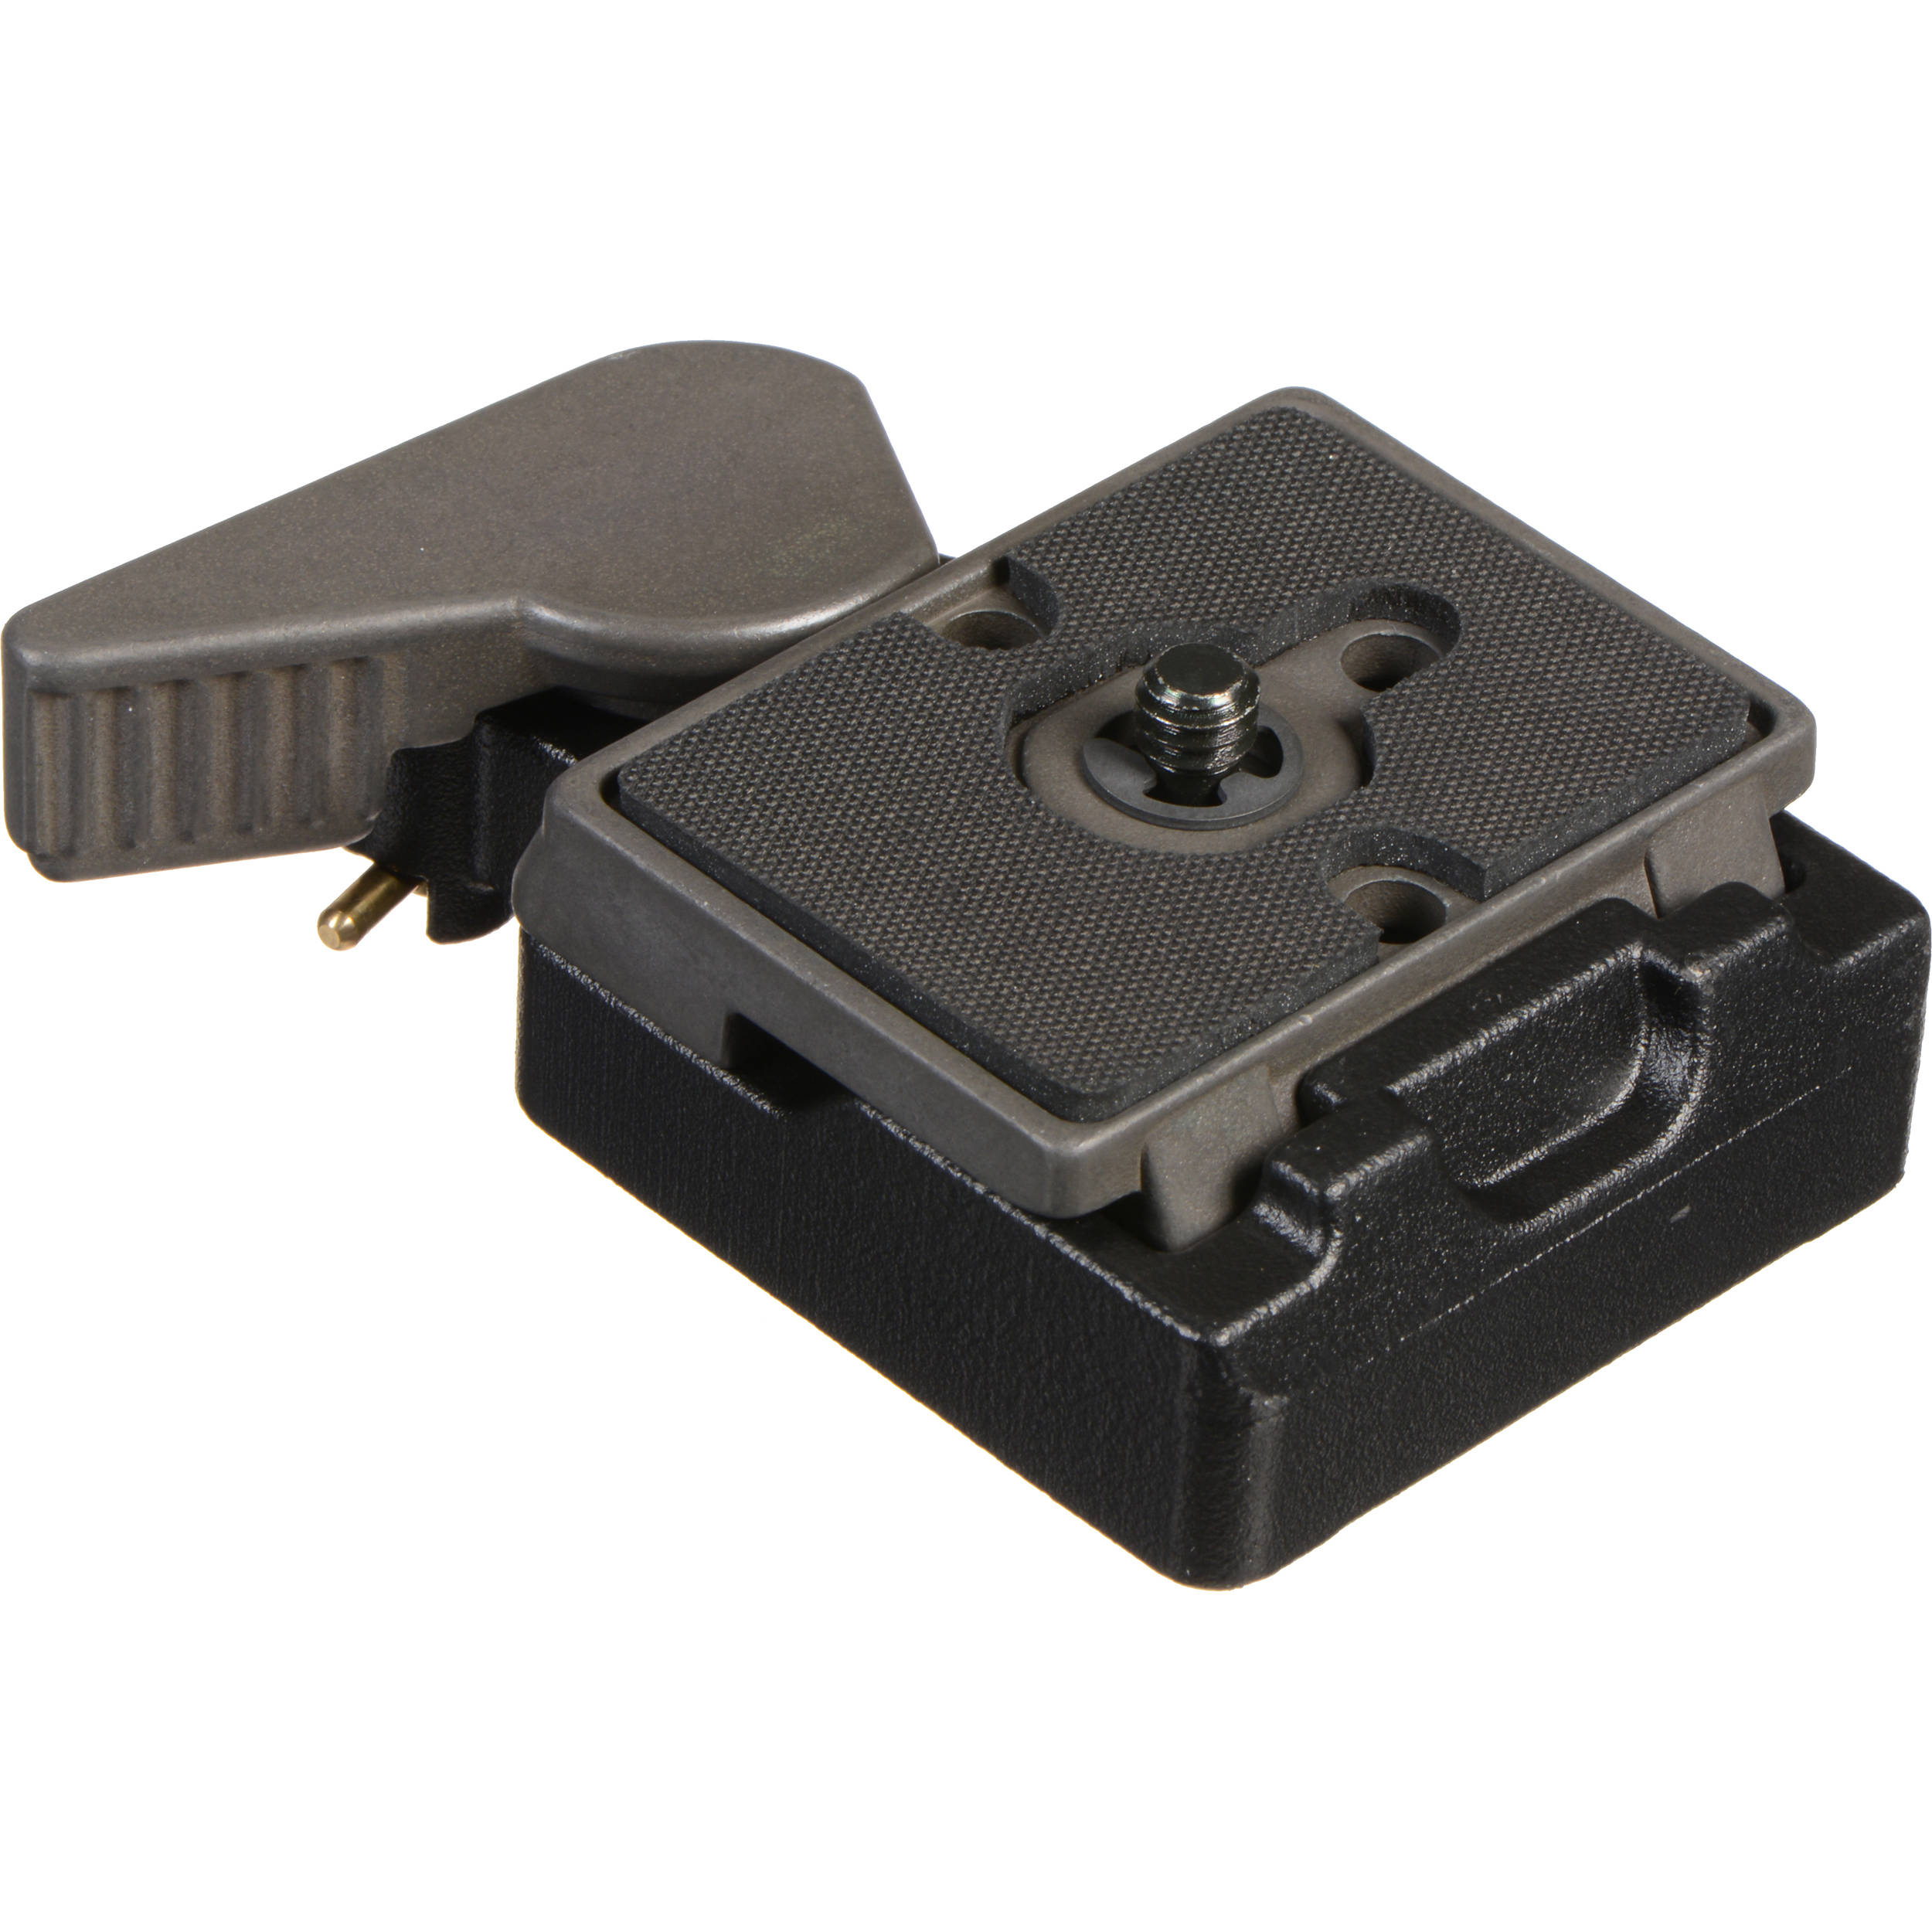 323 RC2-System Quick Release Adapter für Manfrotto Kugelkopf 200PL-14 QR-Pl FG#1